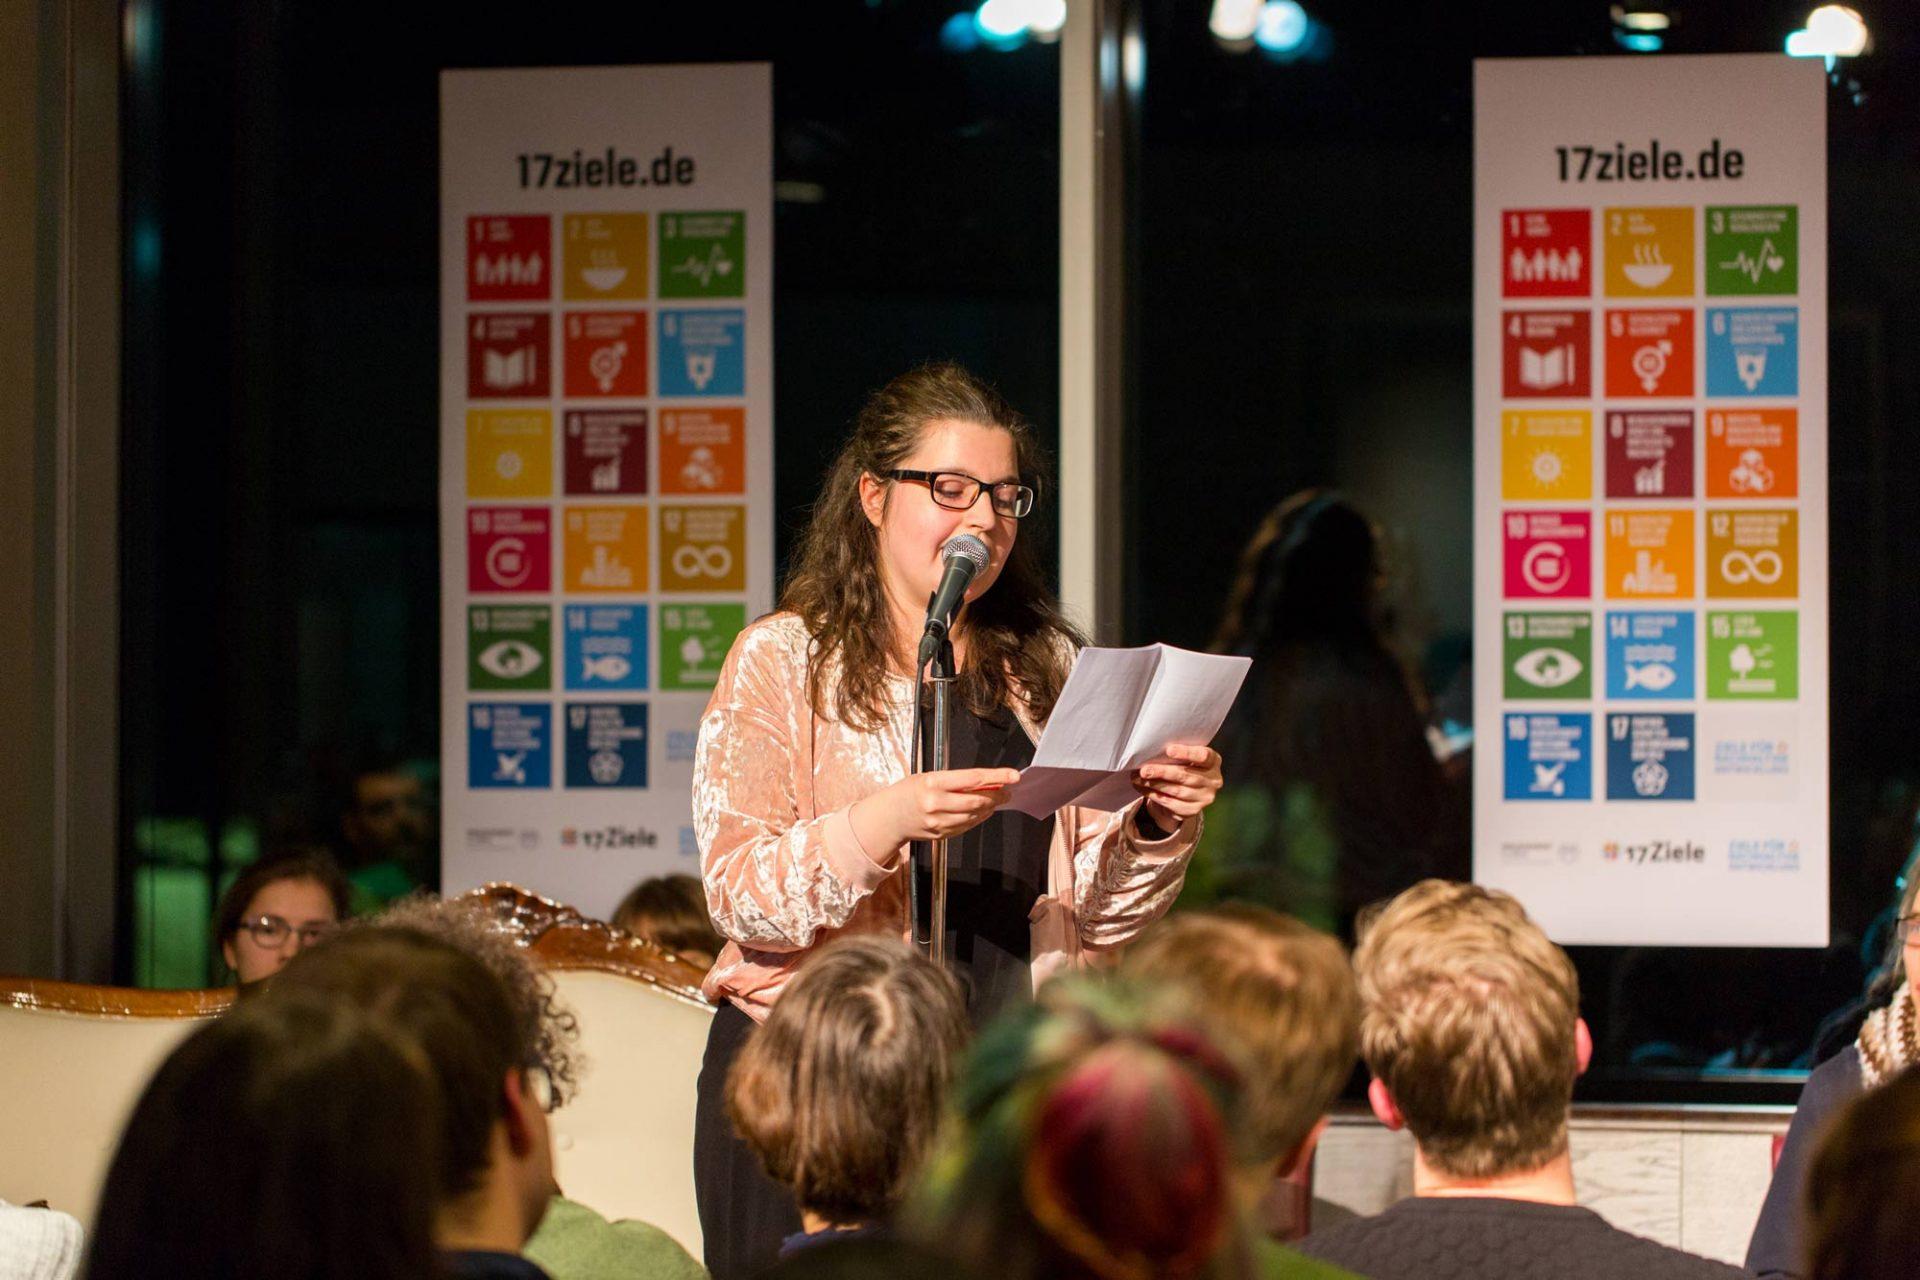 17 Ziele - Poetry Slam @ Halle © offenblende.de